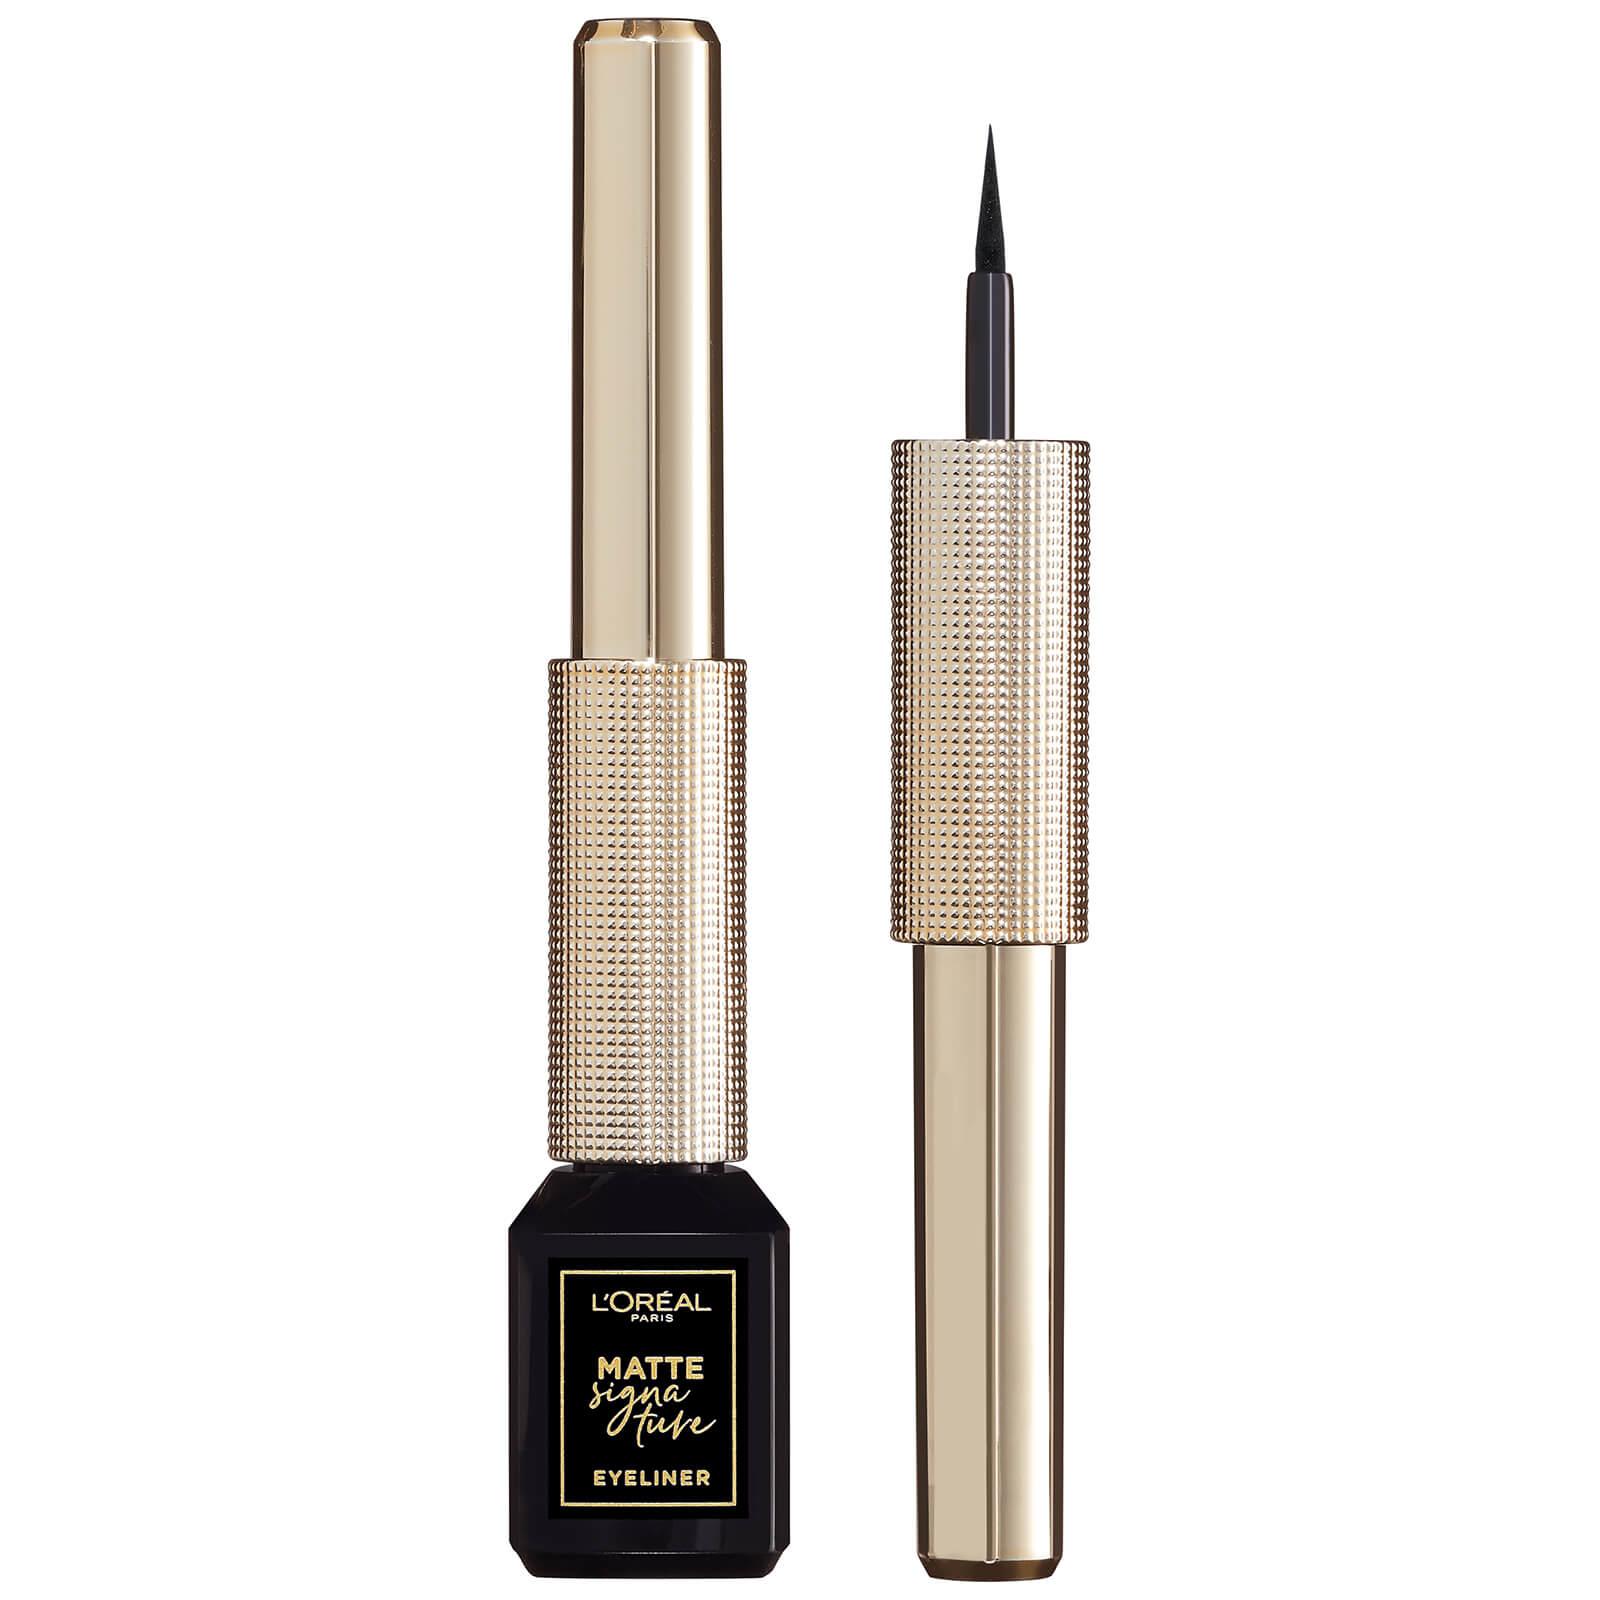 L'Oréal Paris Matte Signature Liquid Eyeliner 3ml (Various Shades) - 01 Black